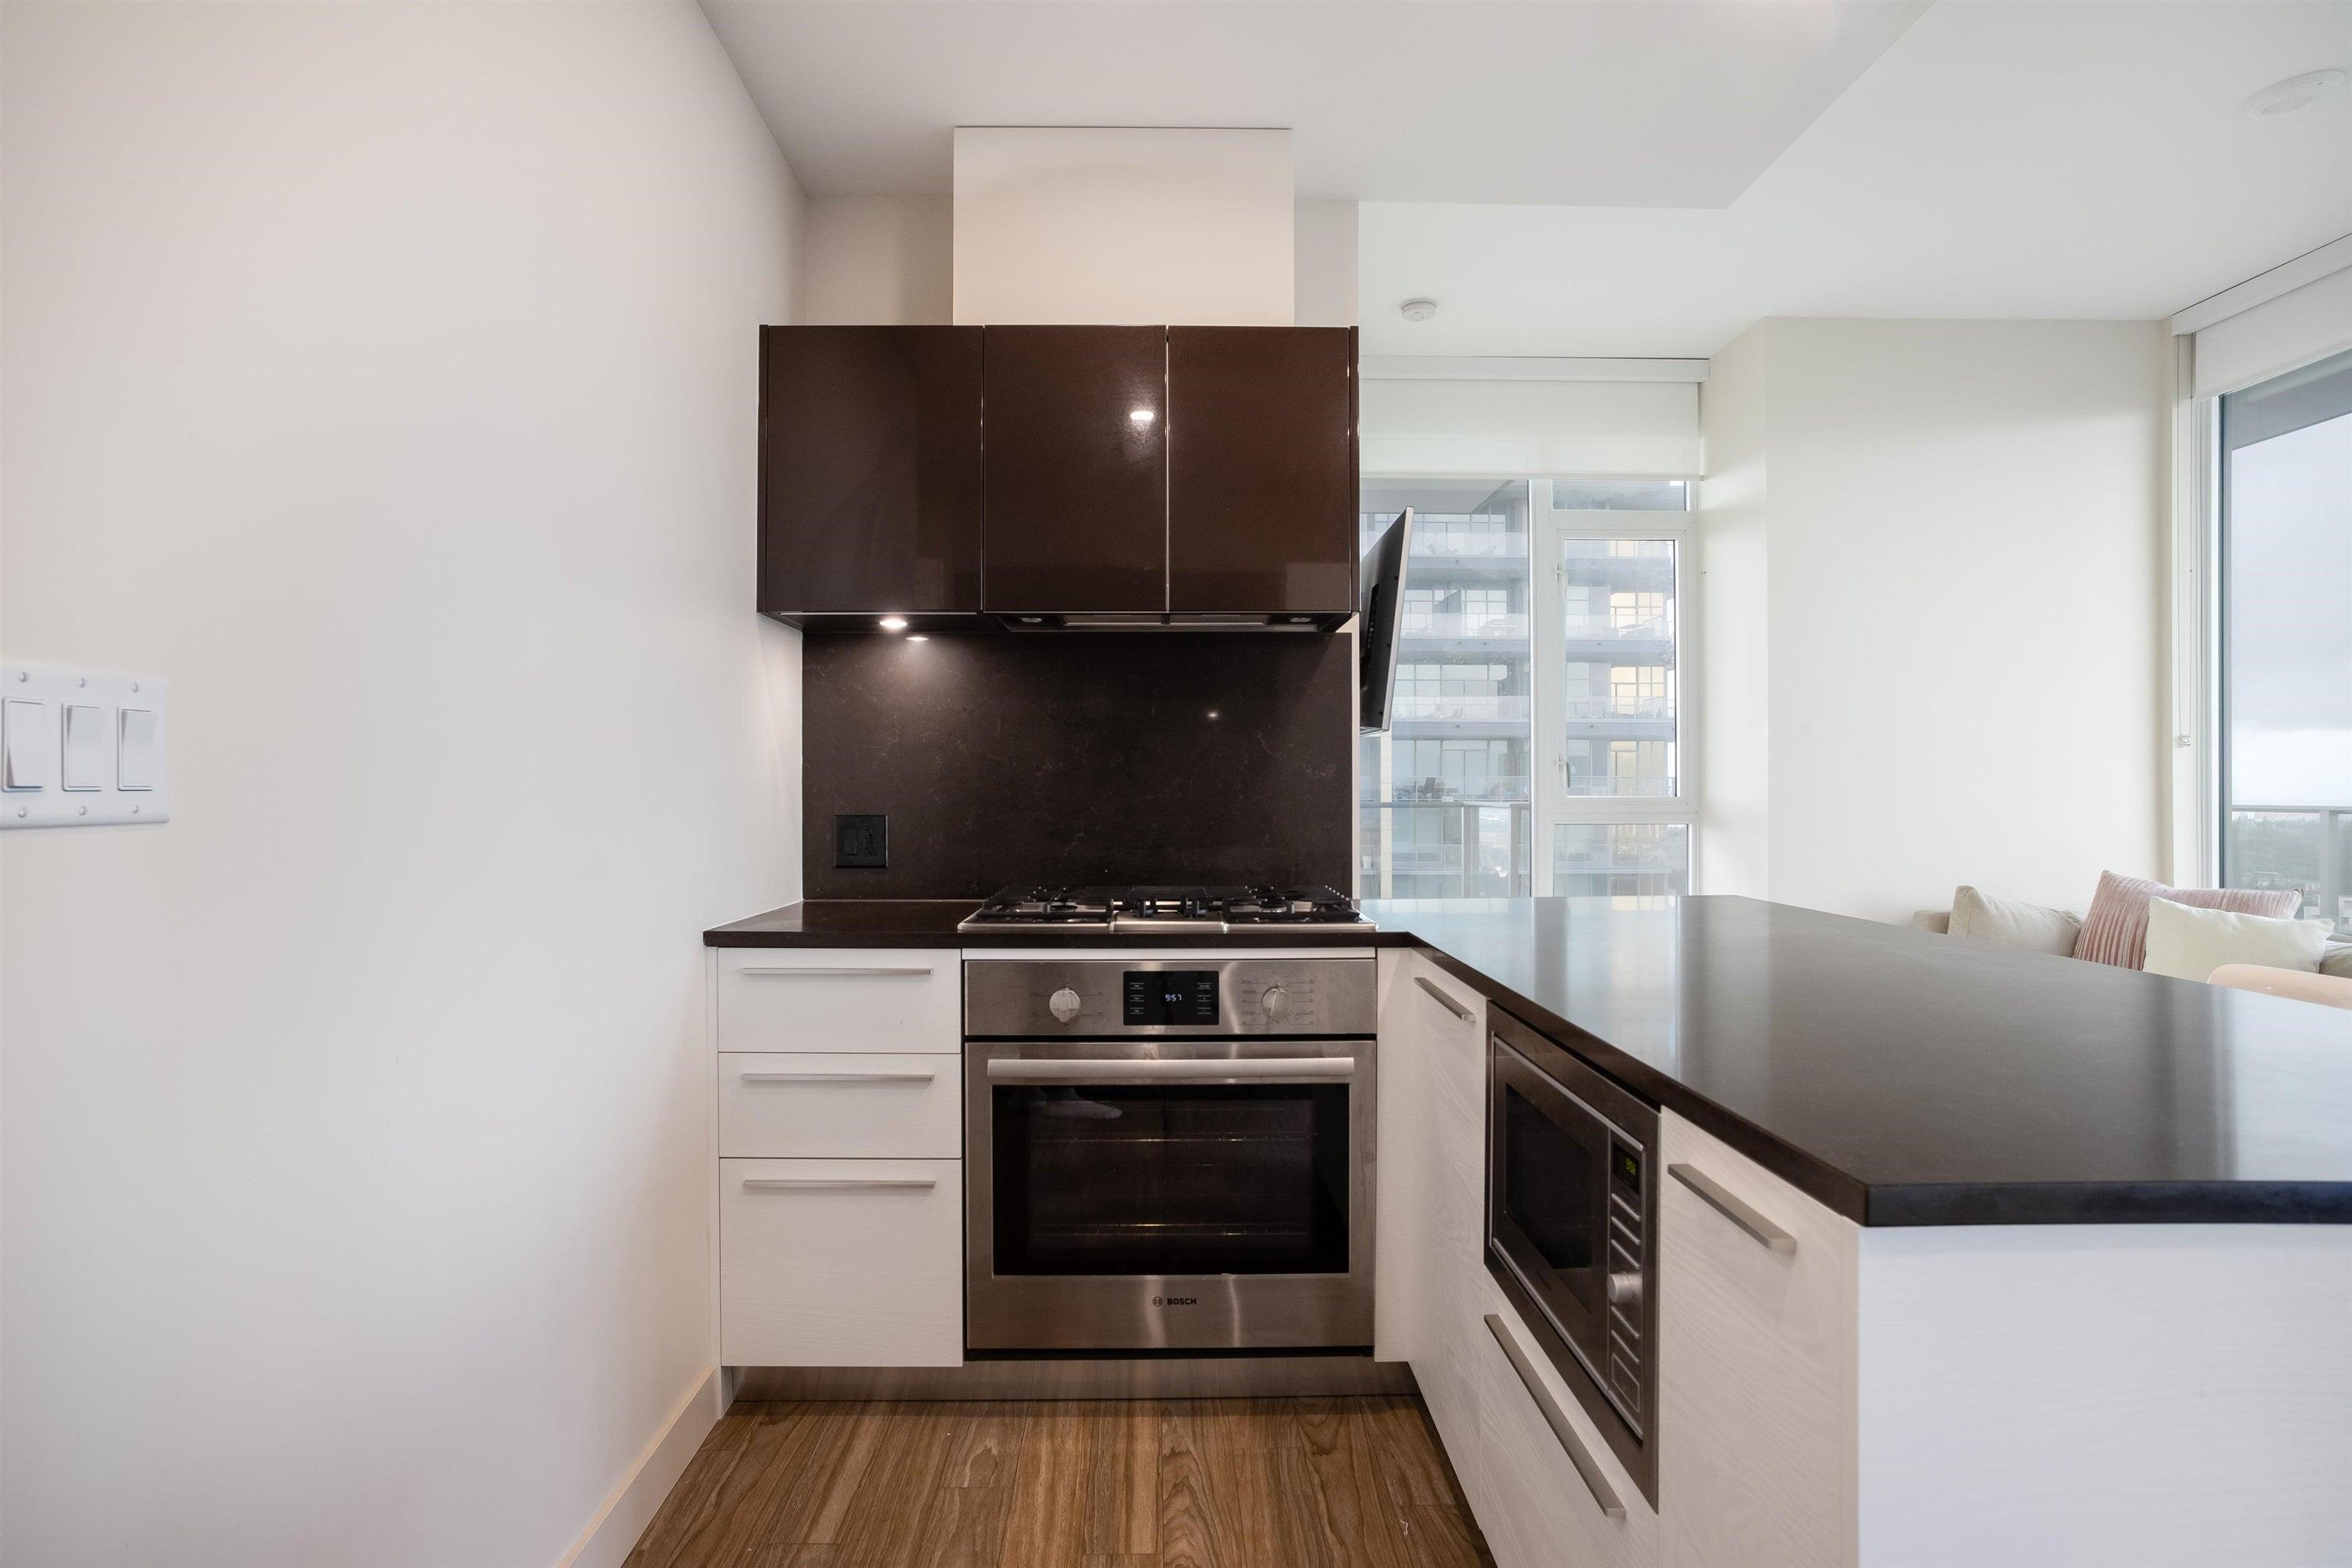 2206 6383 MCKAY AVENUE - Metrotown Apartment/Condo for sale, 2 Bedrooms (R2625647) - #10